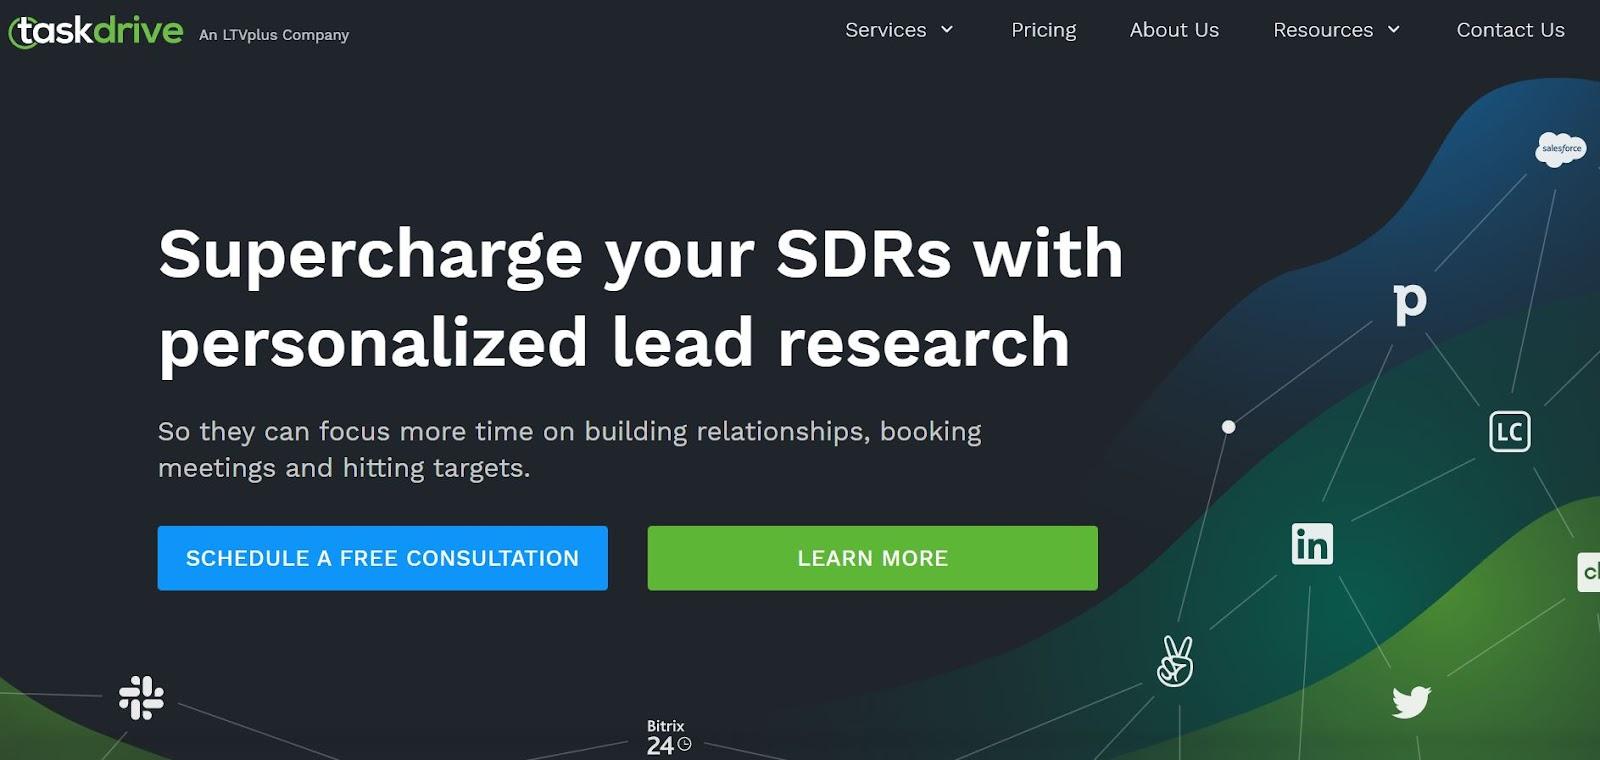 TaskDrive home page